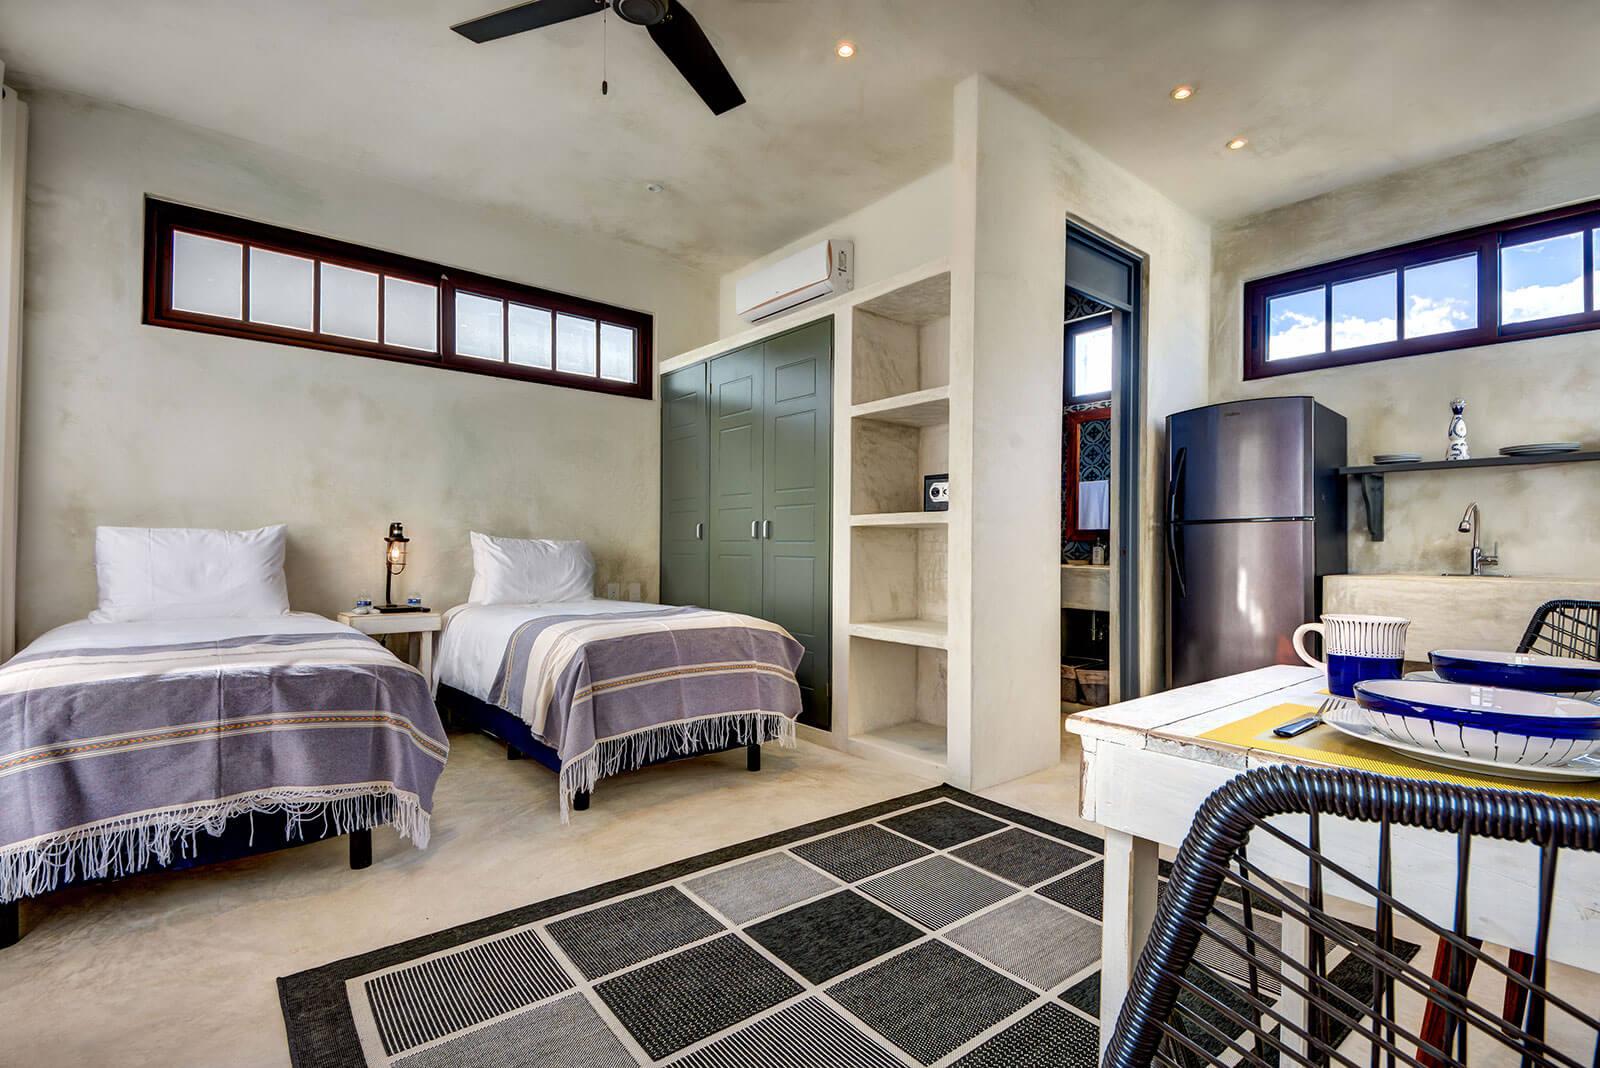 Maya_Luxe_Riviera_Maya_Luxury_Villas_Experiences_Tulum_Soliman_Bay_5_Bedrooms_35.jpg